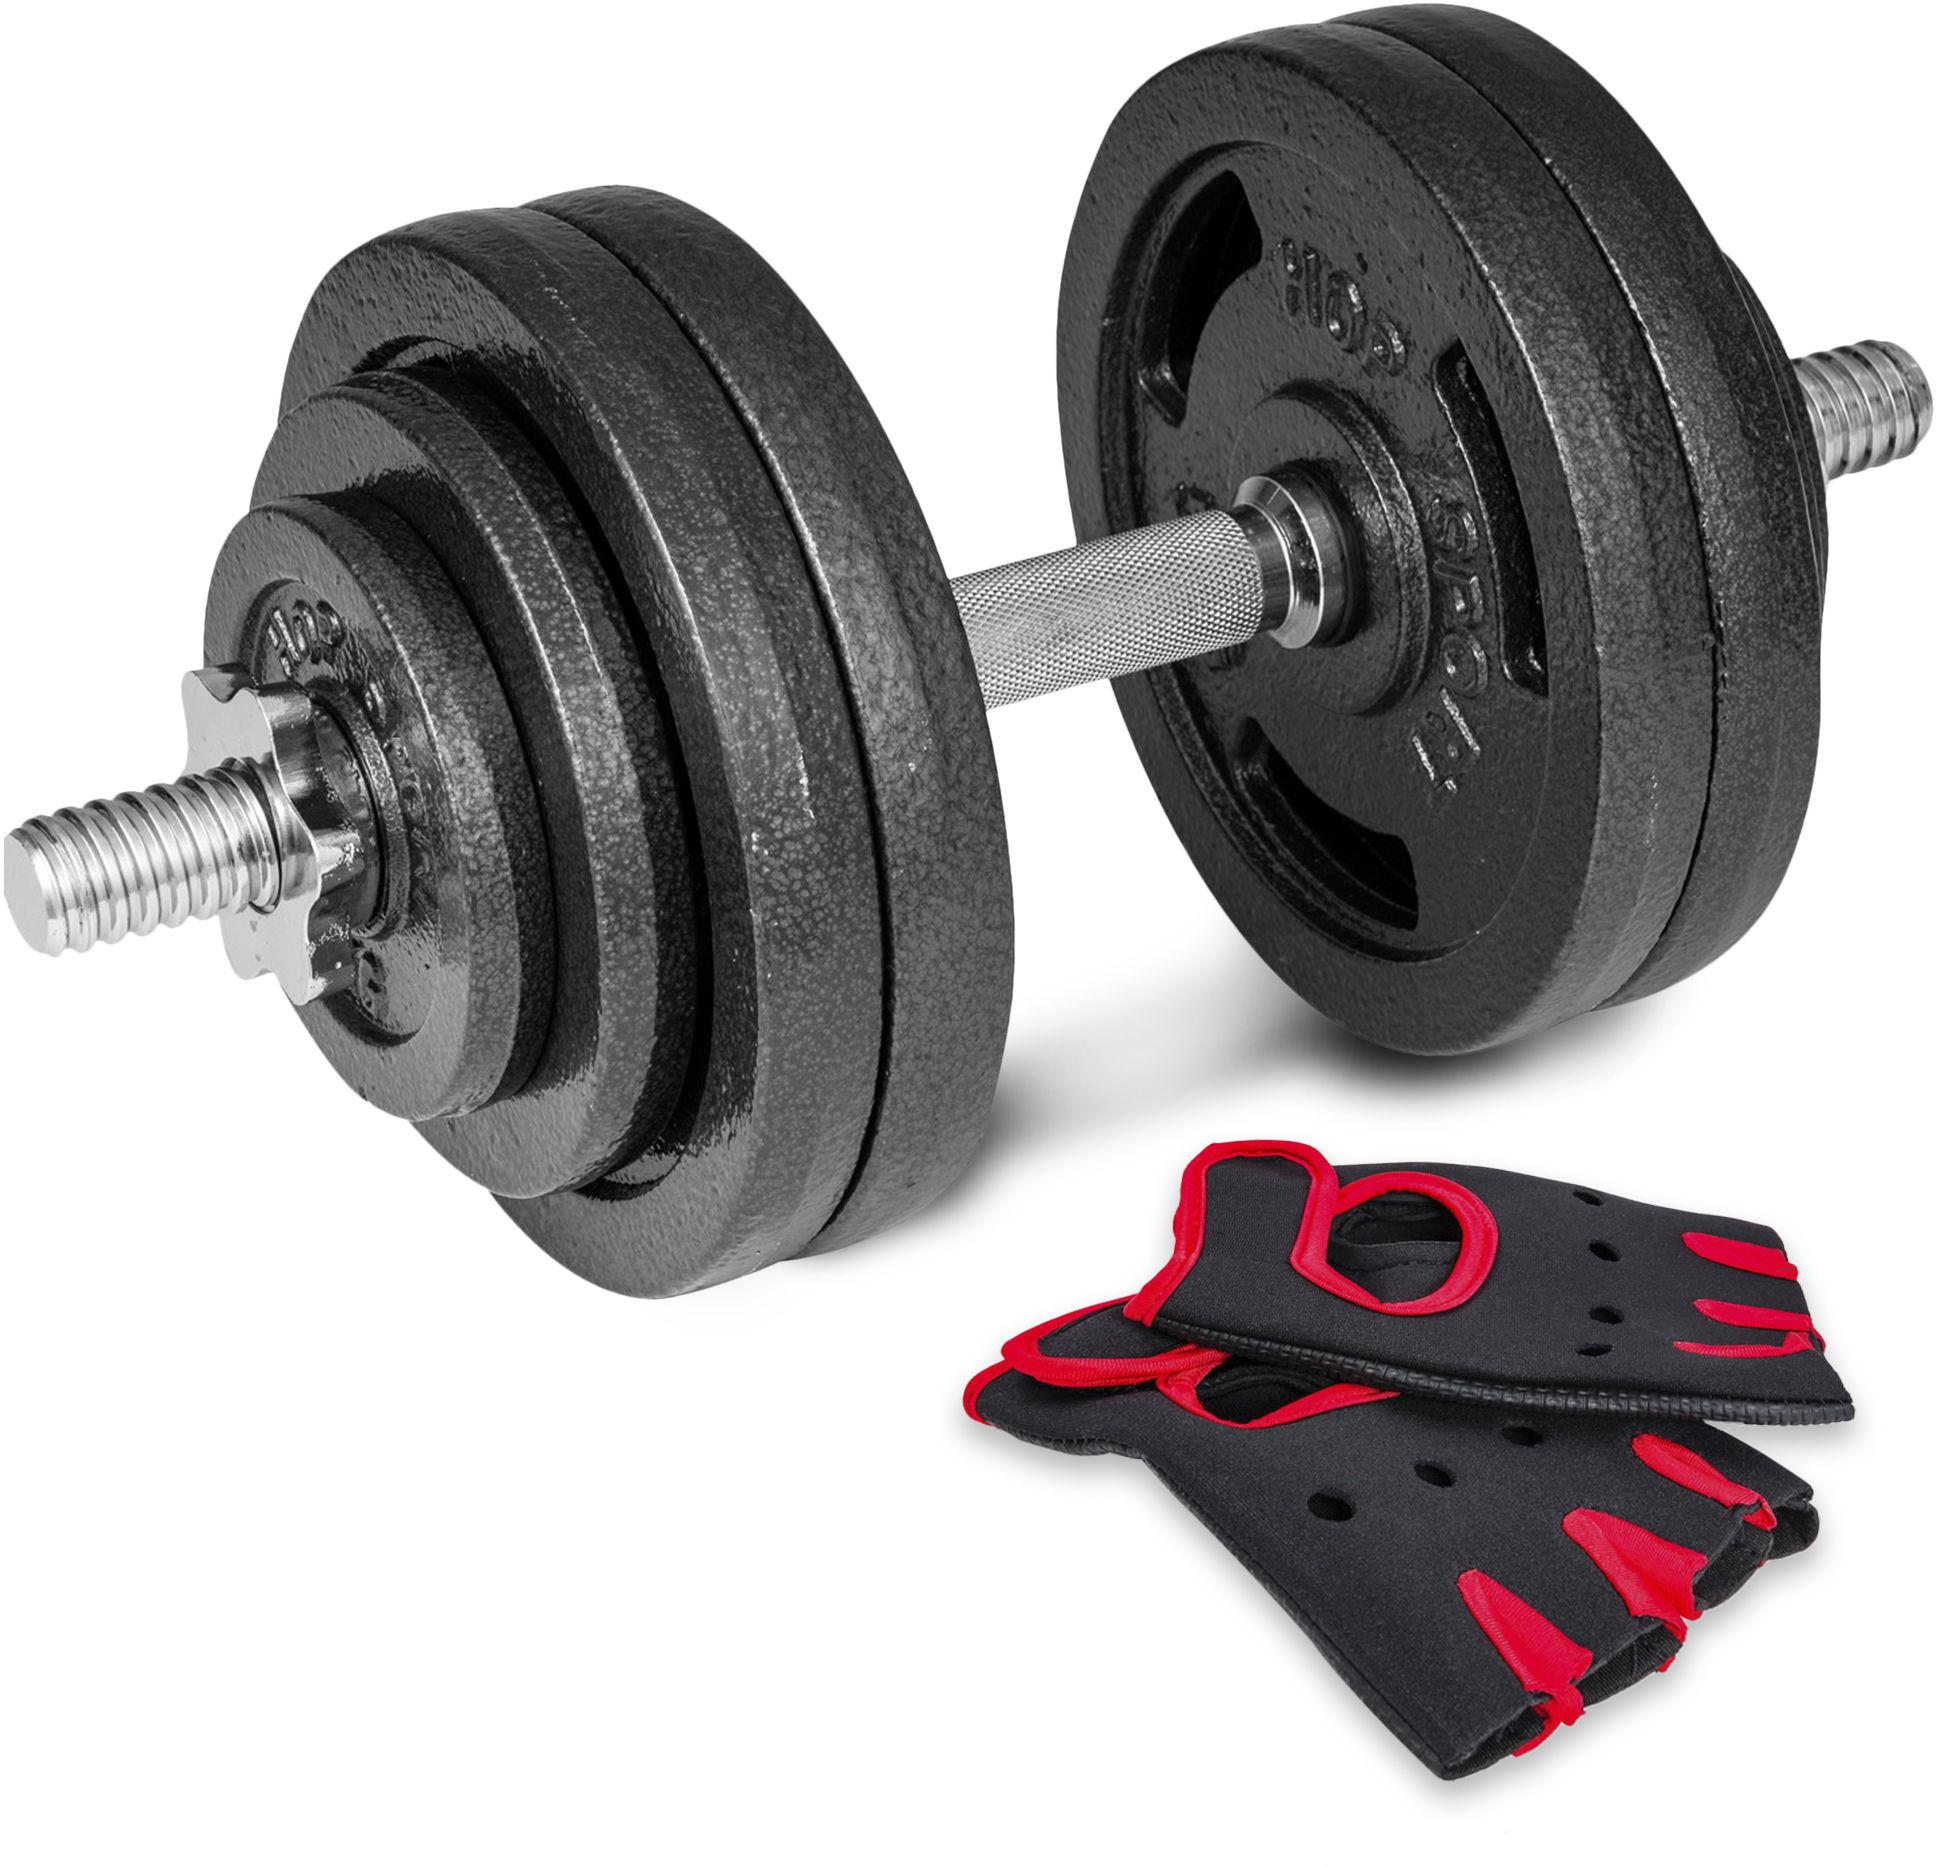 Hantla żeliwna strong Hop-Sport 1x30kg z rękawiczkami